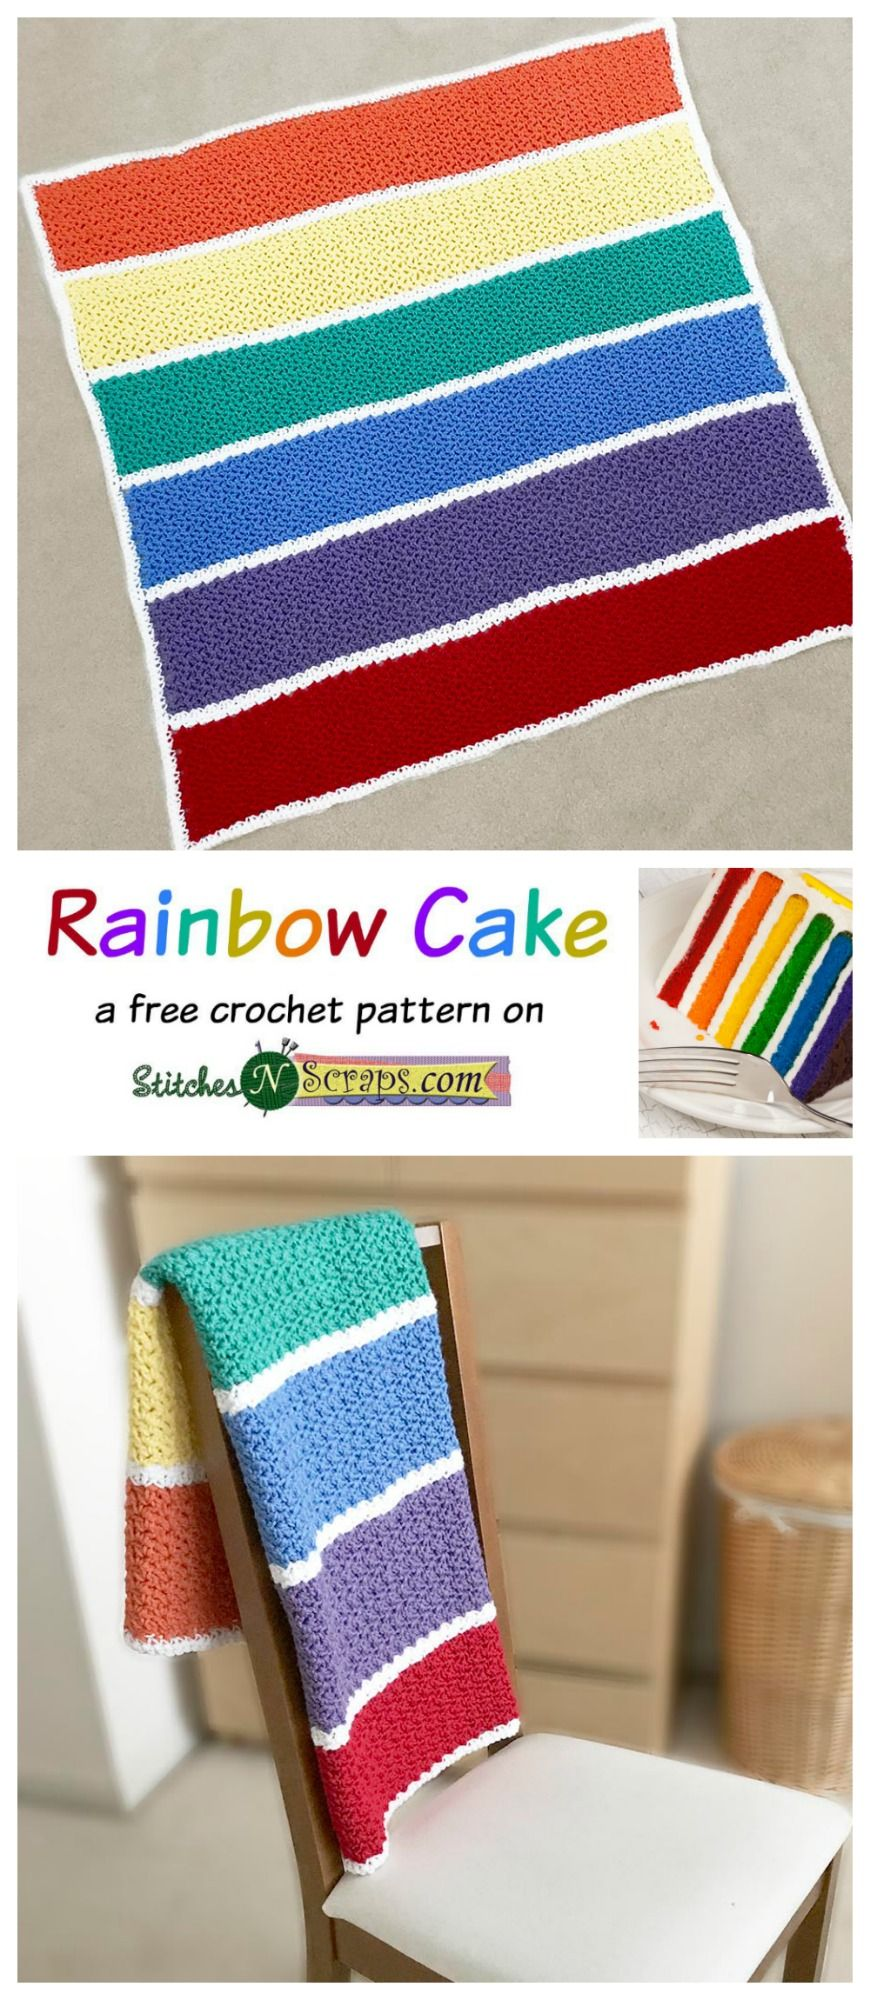 Free Pattern - Rainbow Cake | Häkeldecke und Häkeln